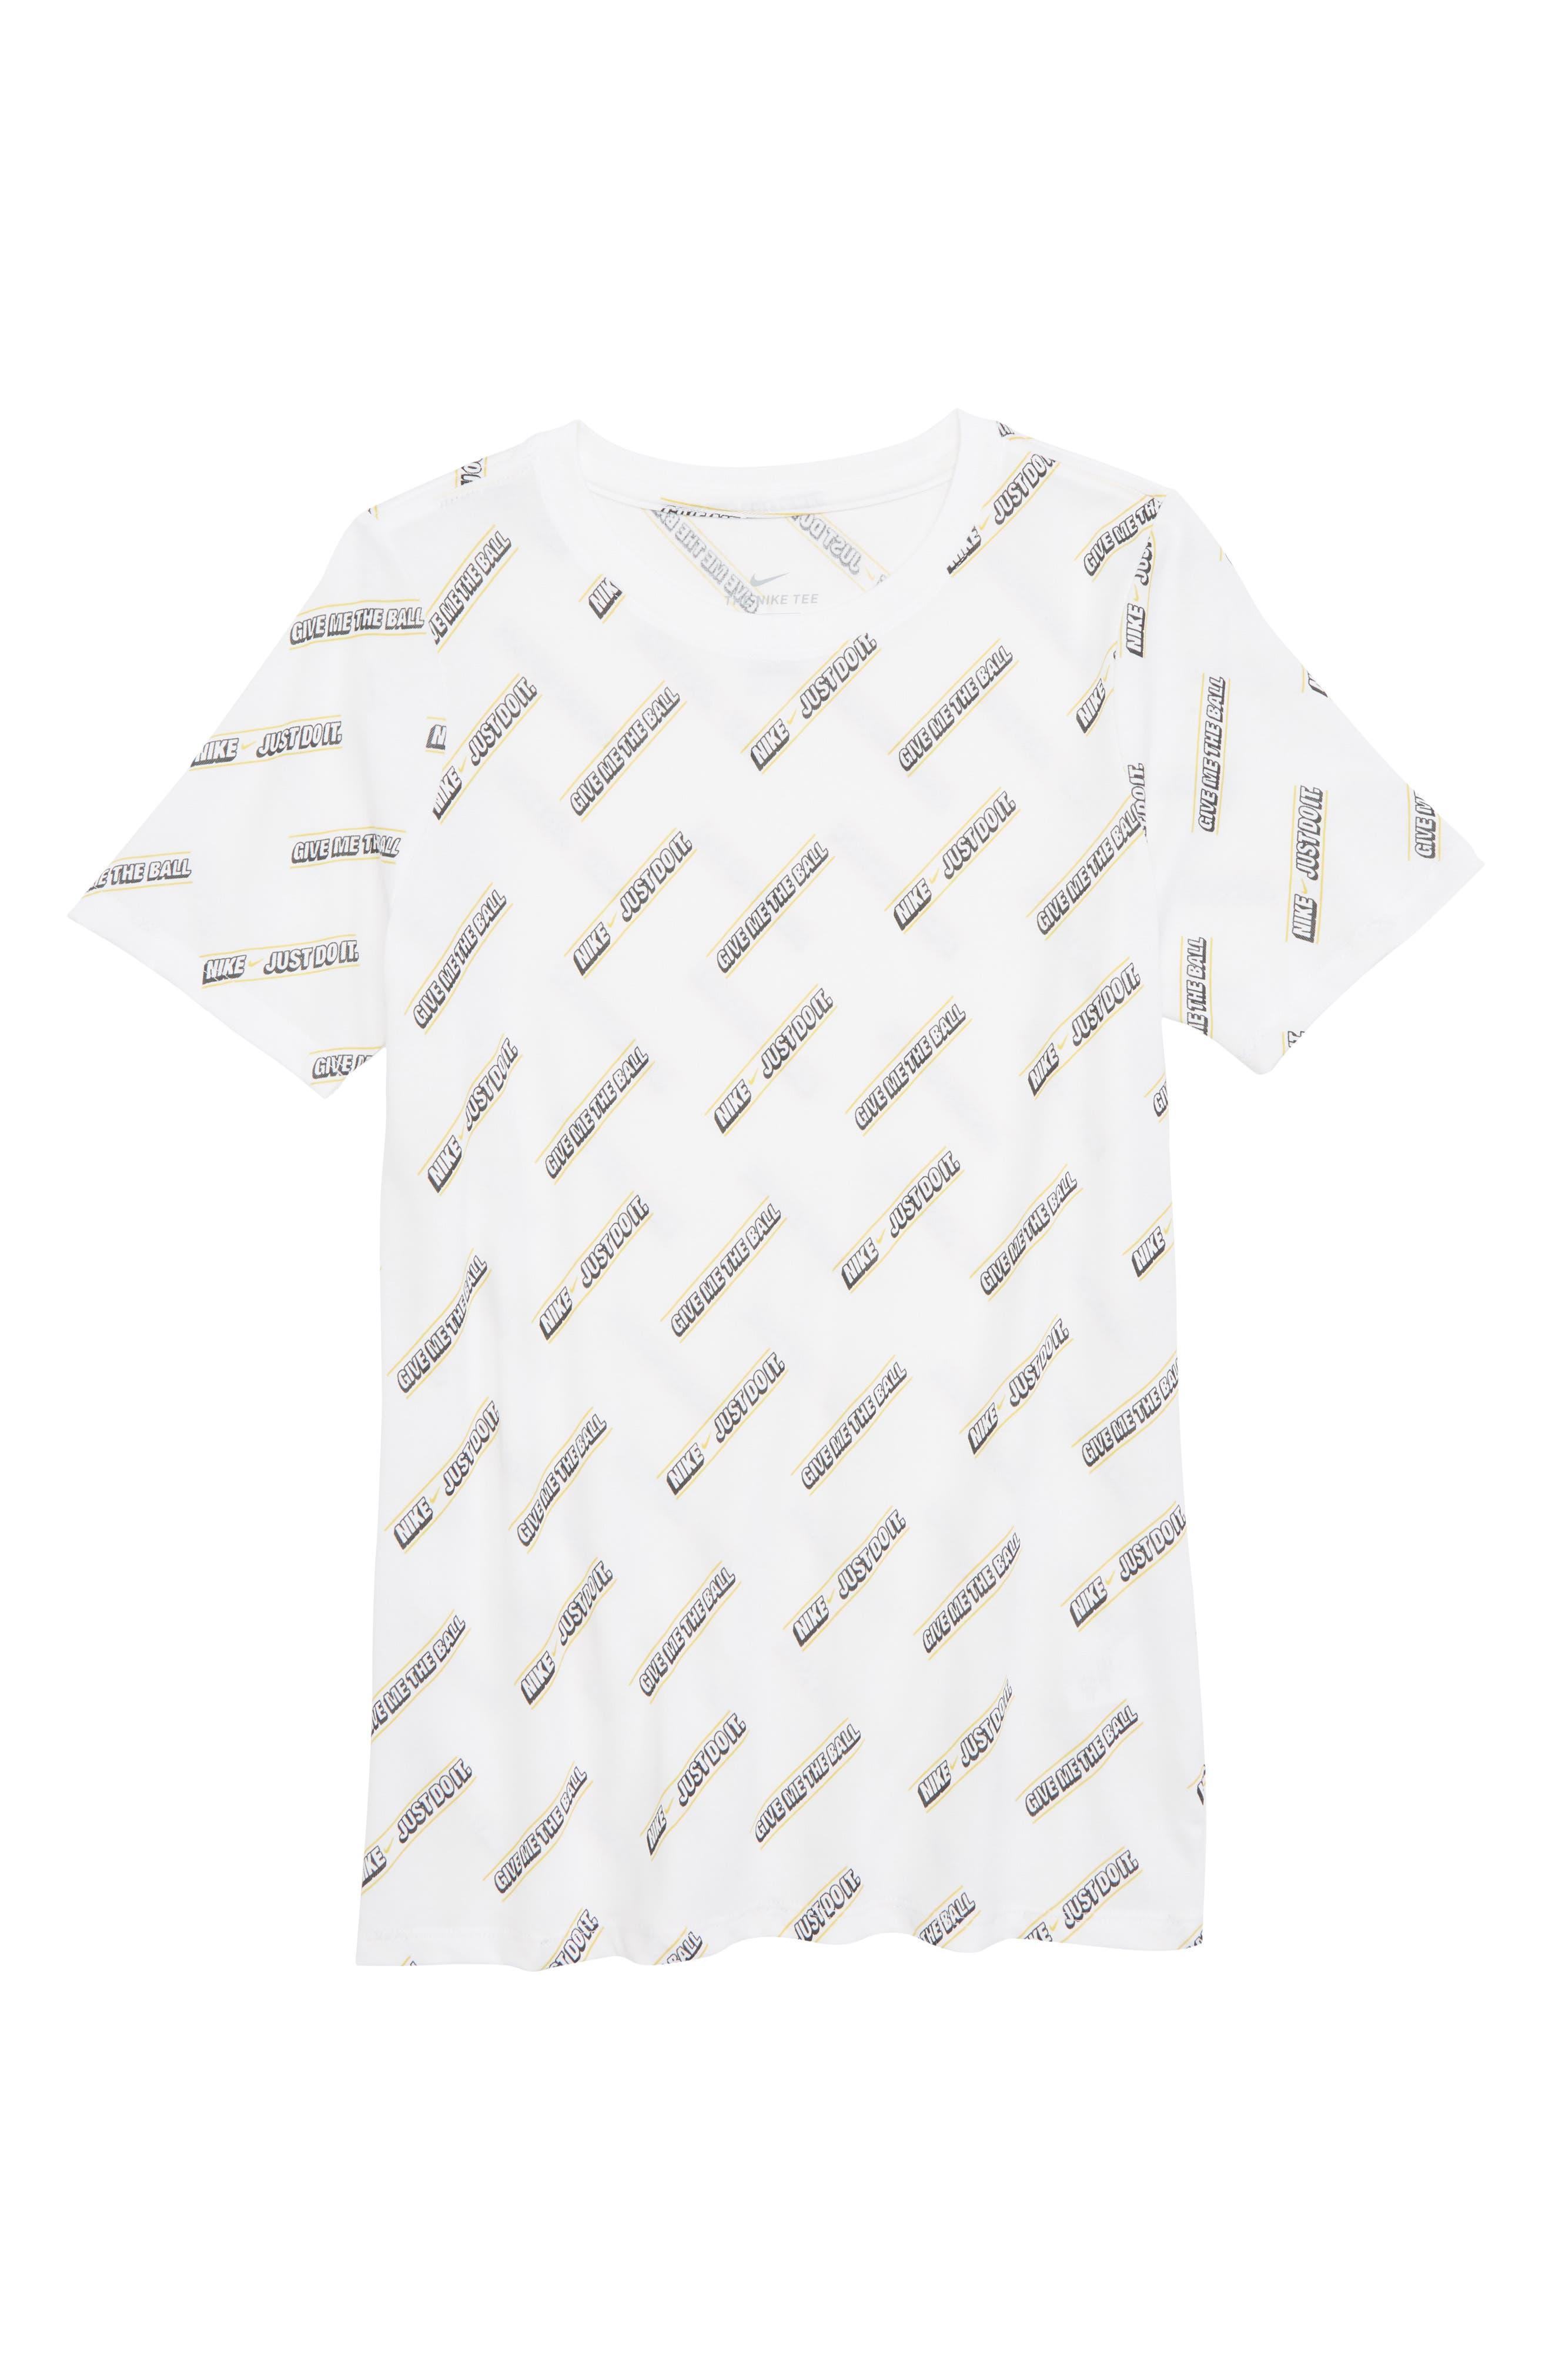 Dry Give Me the Ball Print T-Shirt,                             Main thumbnail 1, color,                             WHITE